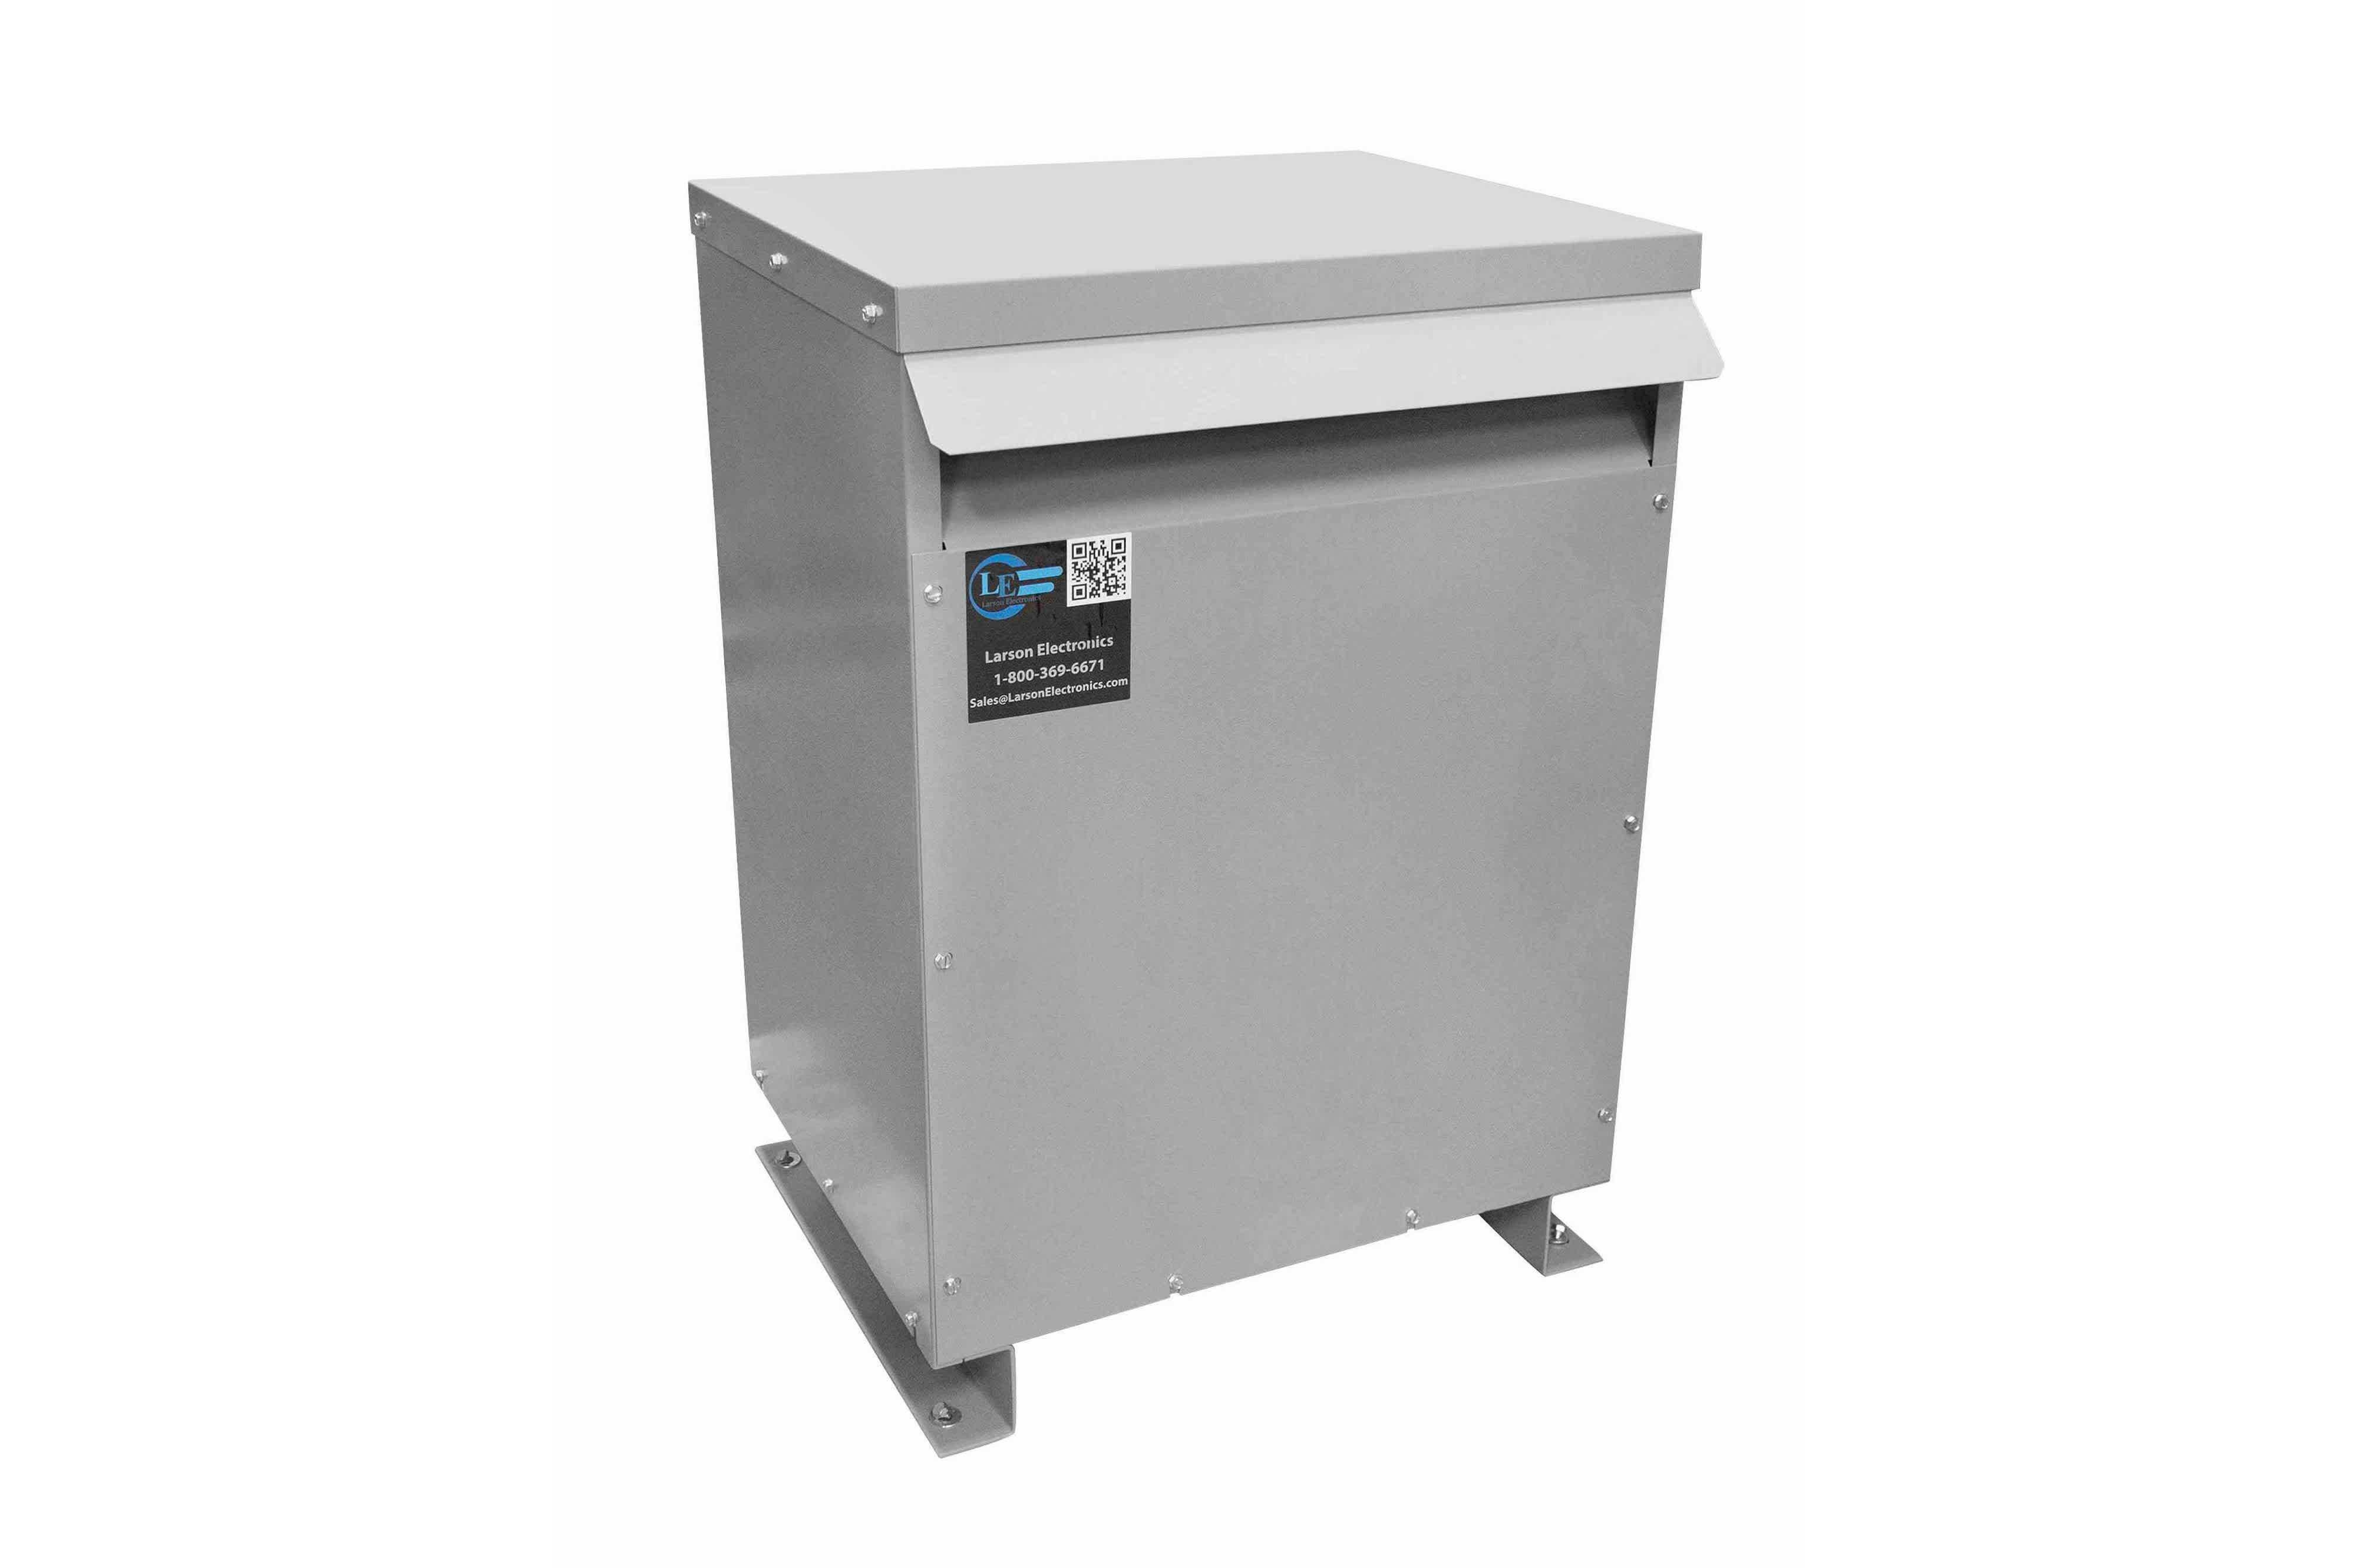 800 kVA 3PH DOE Transformer, 240V Delta Primary, 208Y/120 Wye-N Secondary, N3R, Ventilated, 60 Hz